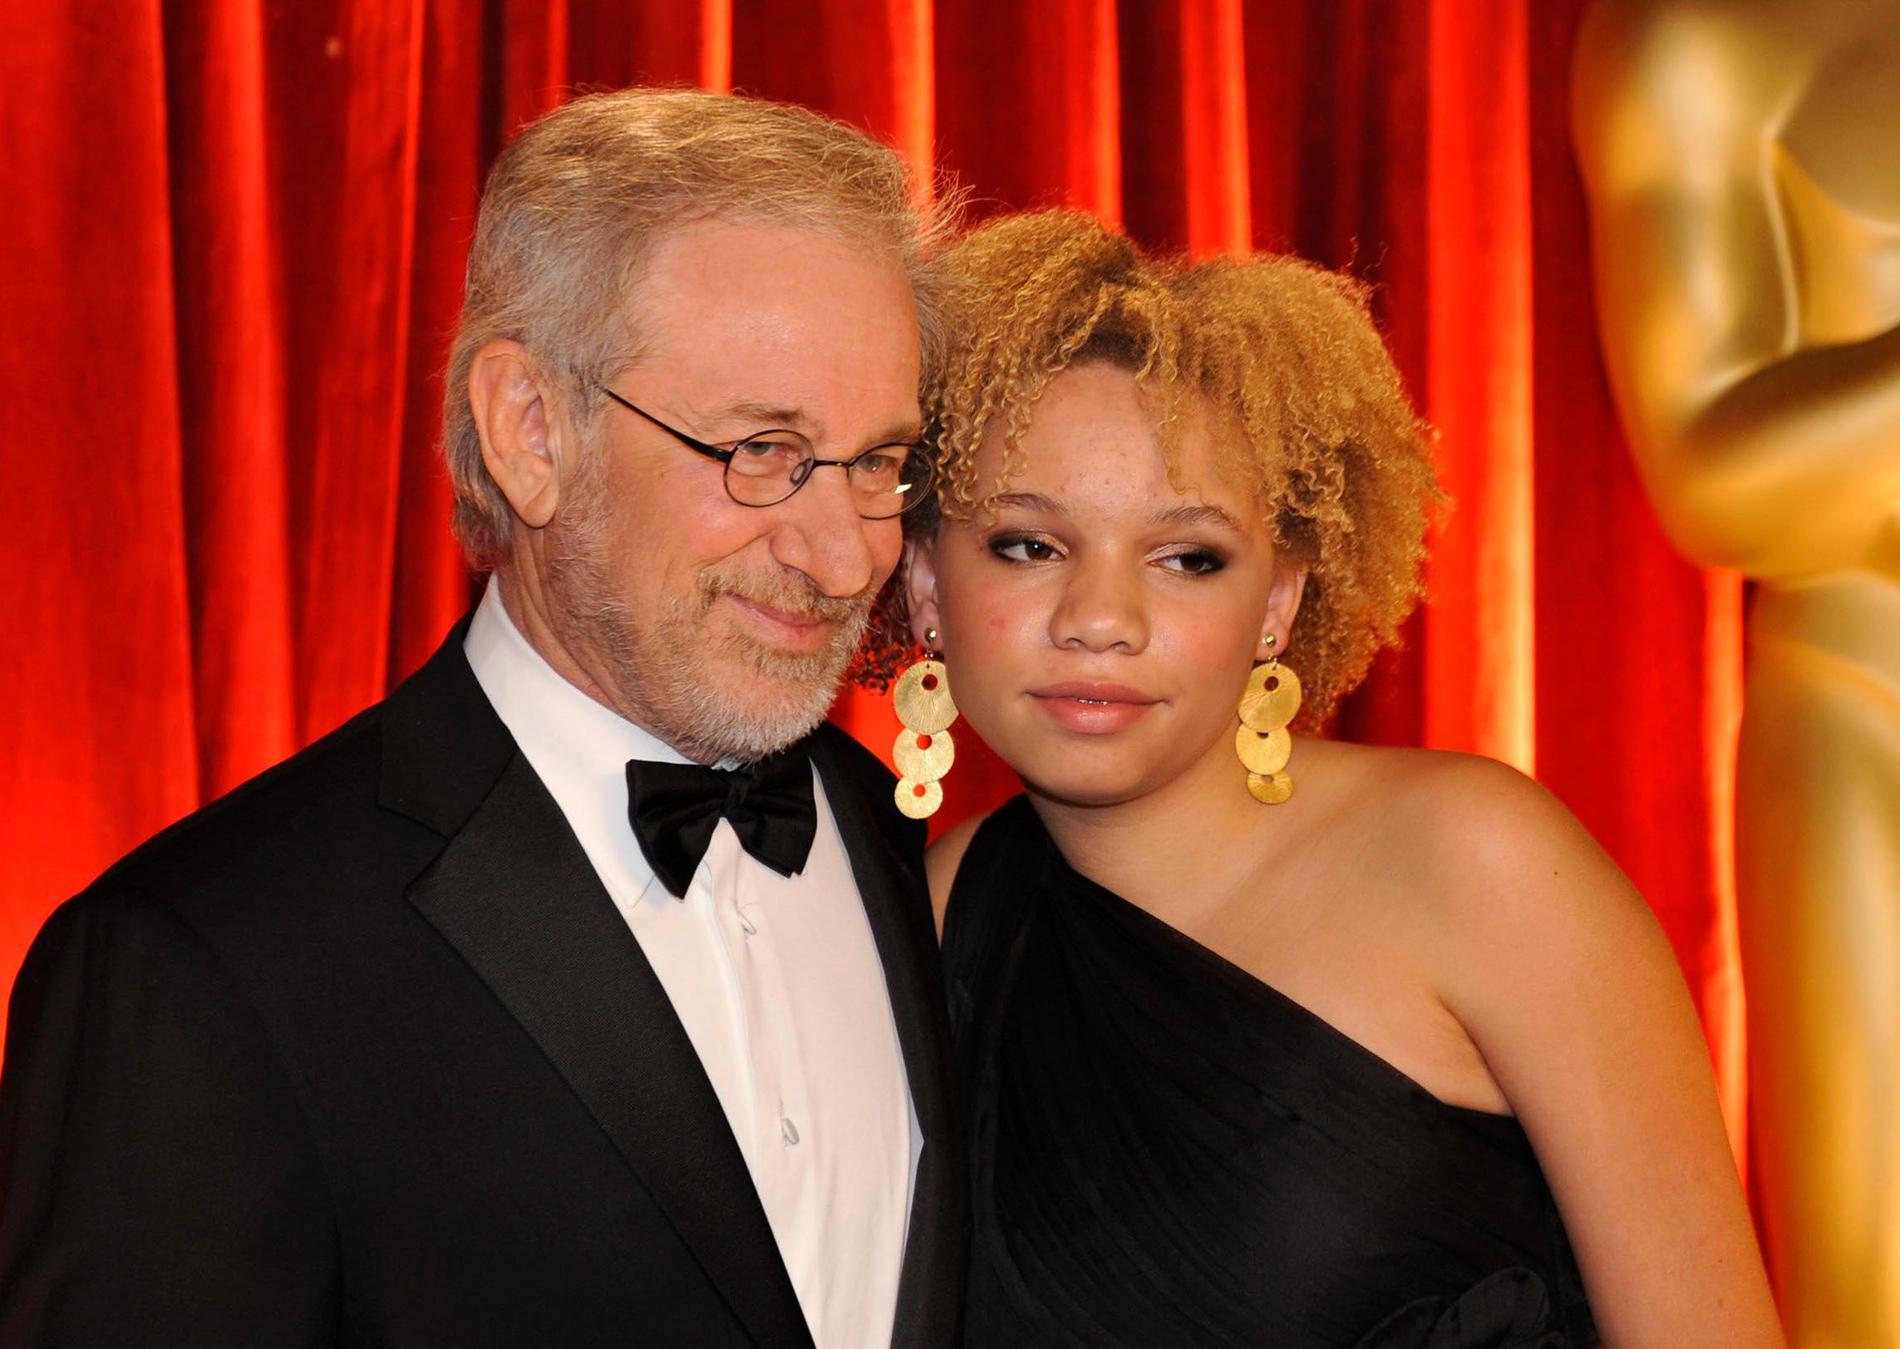 Steven Spielberg med dottern Mikaela Spielberg.